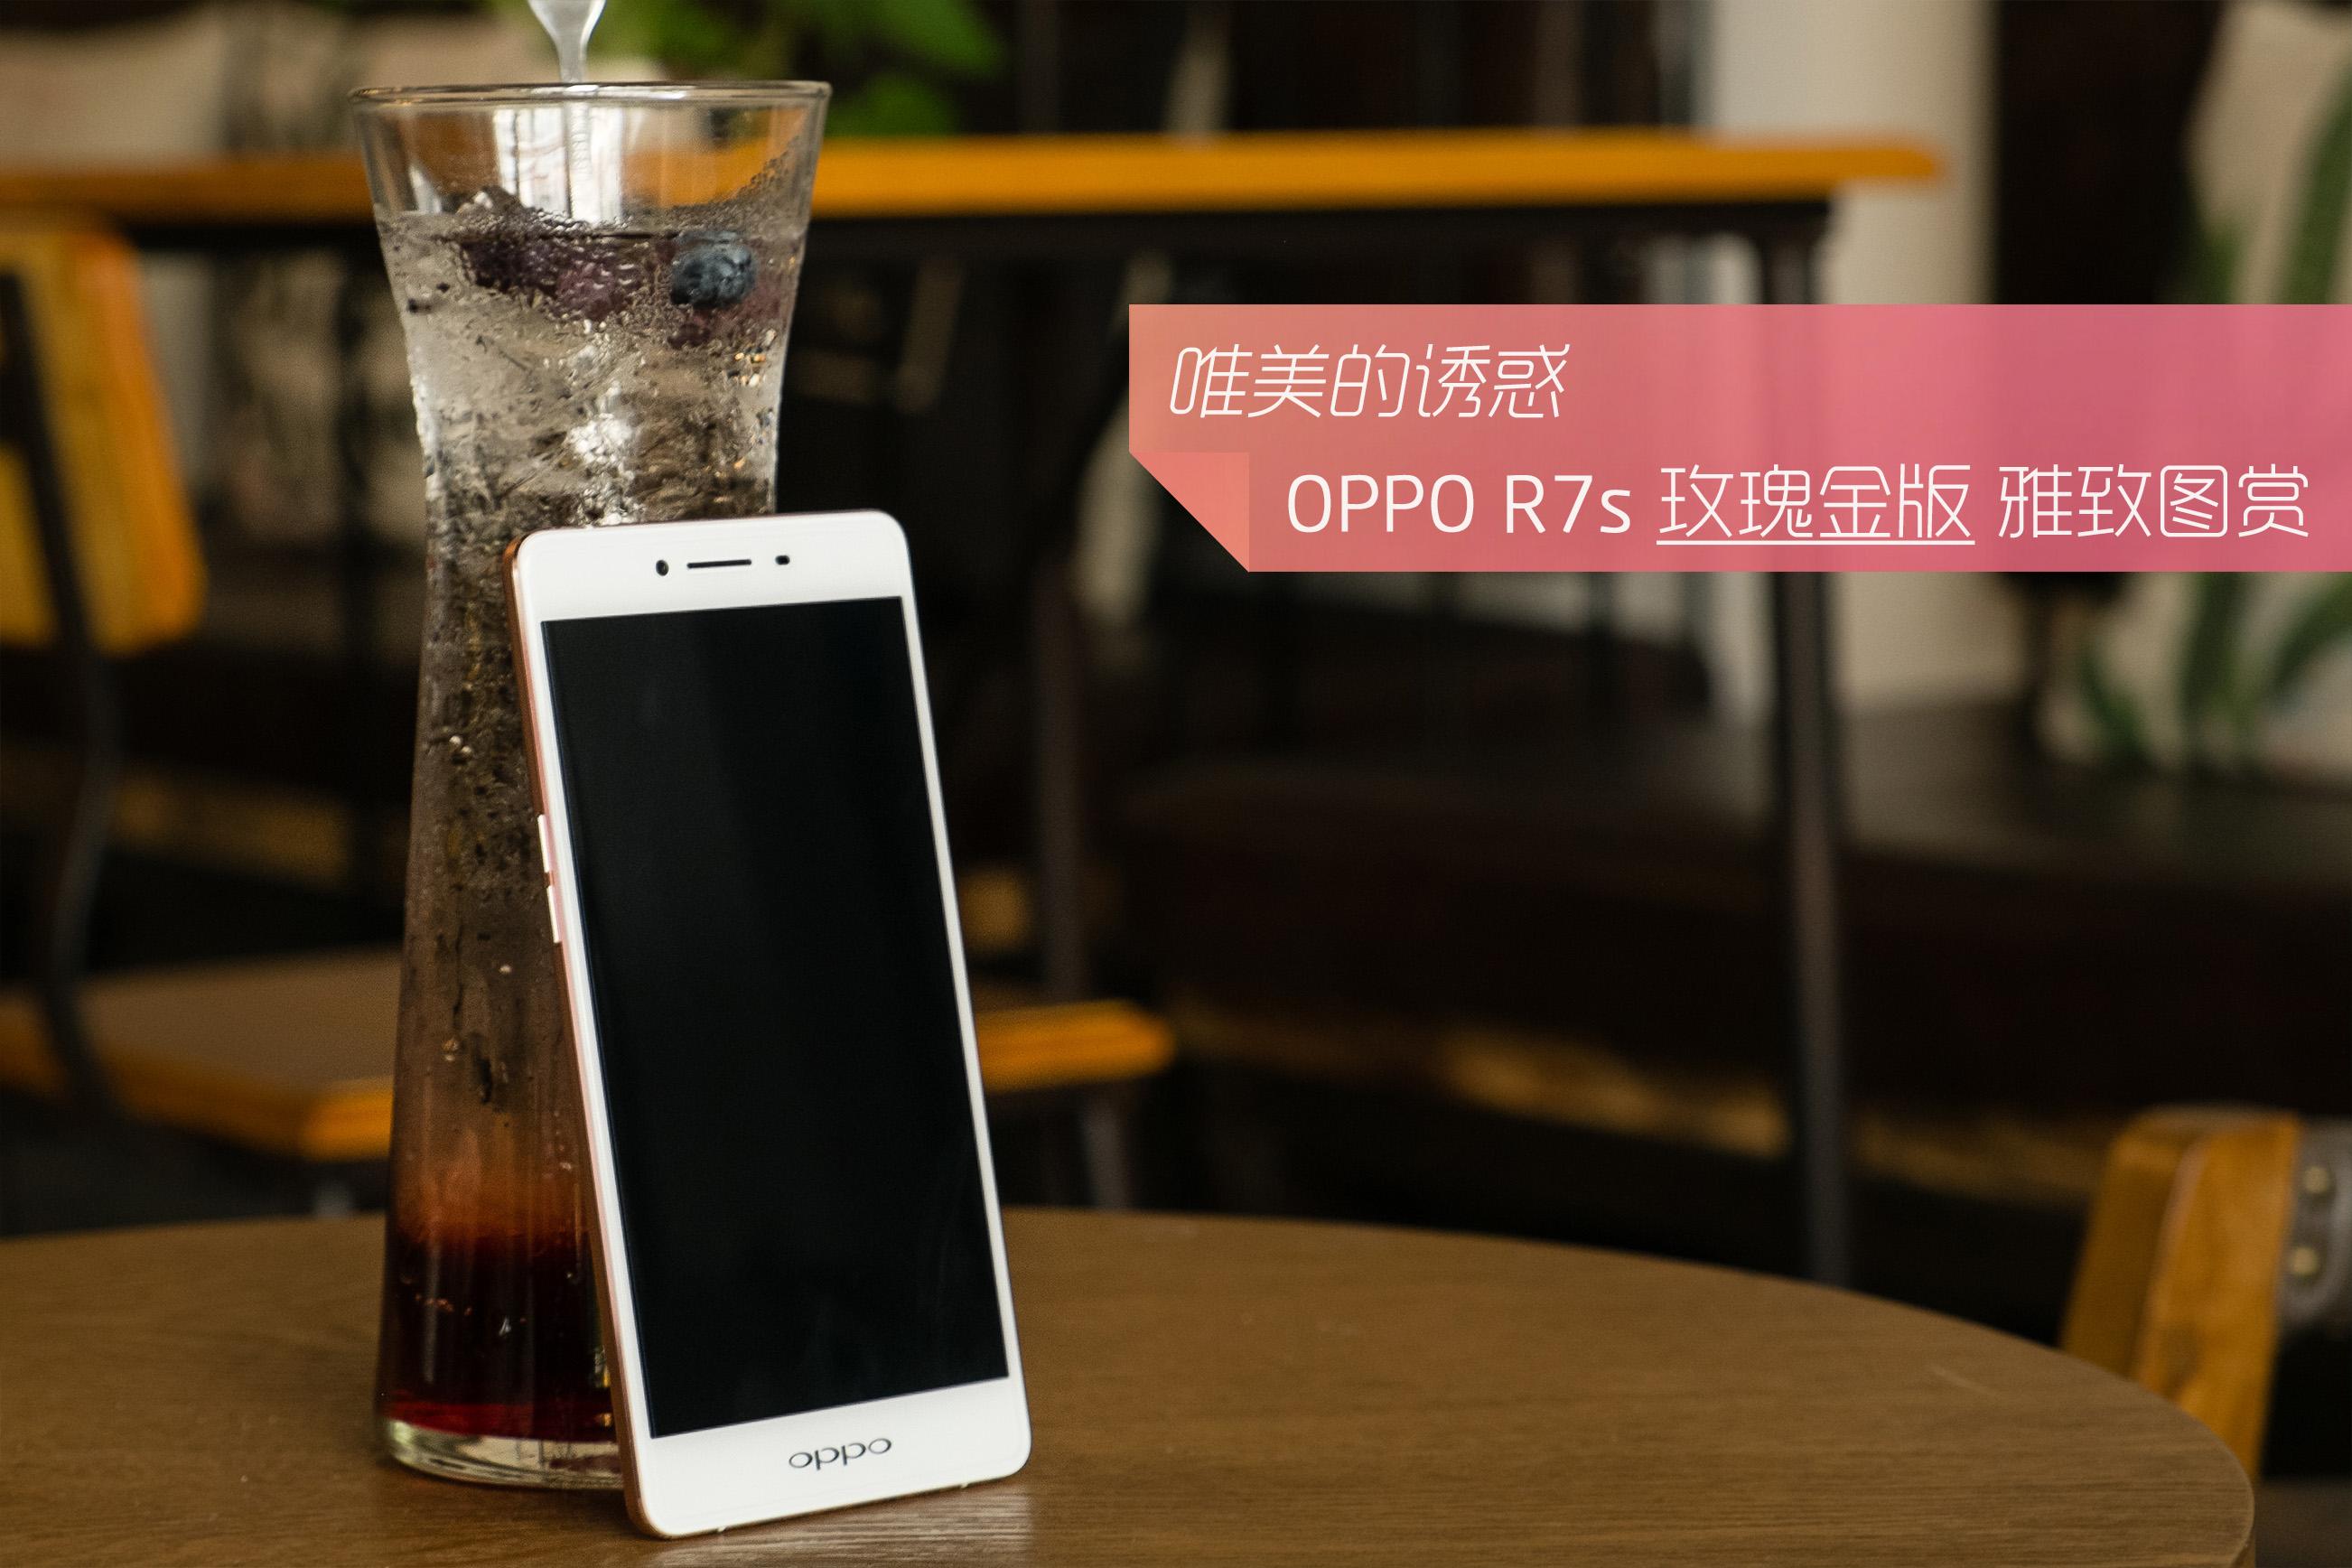 OPPOR7s玫瑰金版高清图赏